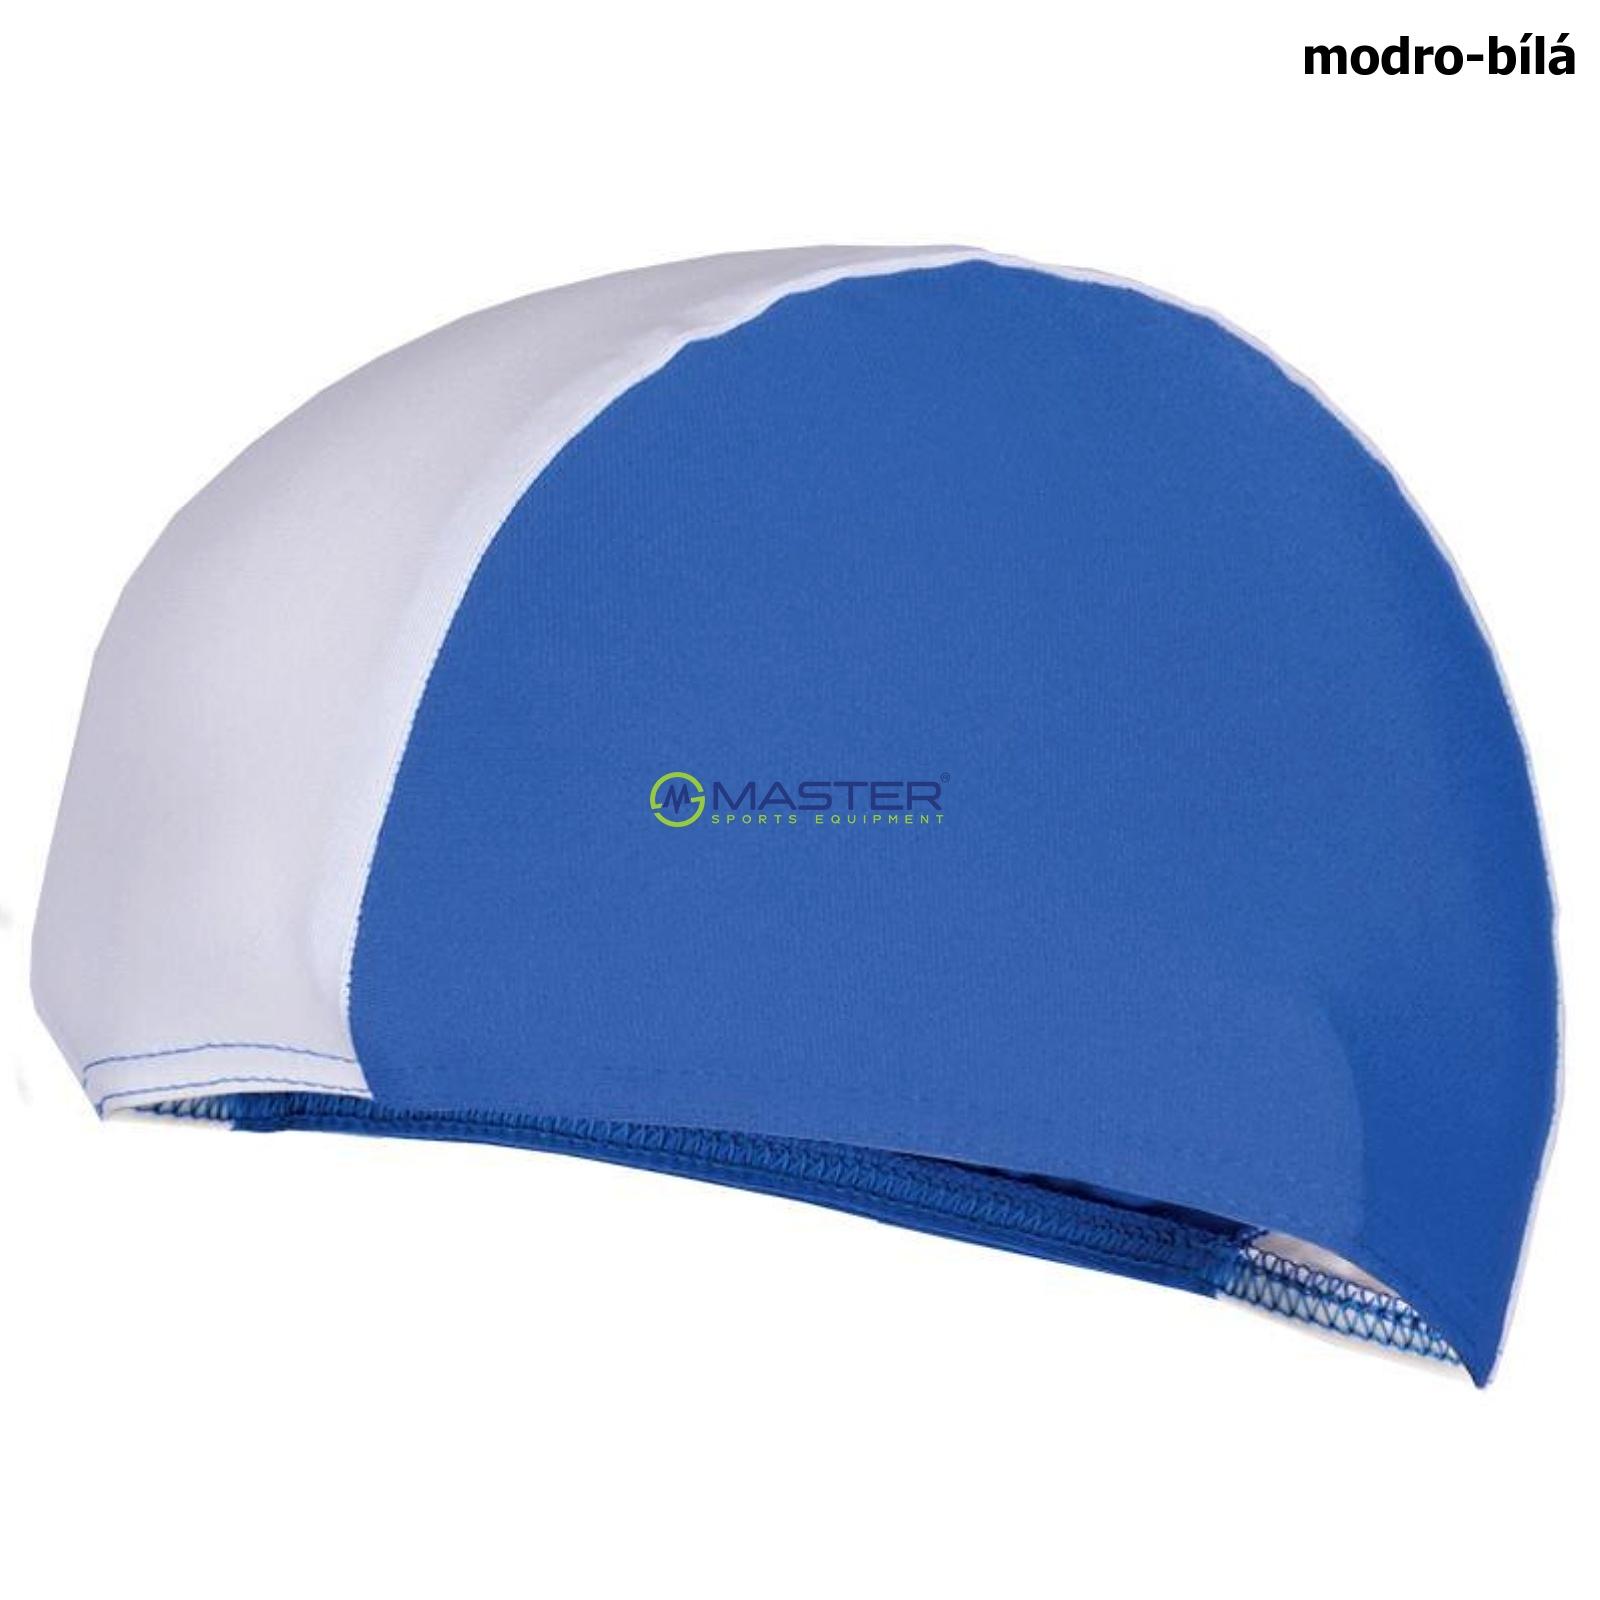 Plavecká čepice SPOKEY Lycras - modro-bílá  67137ef66e